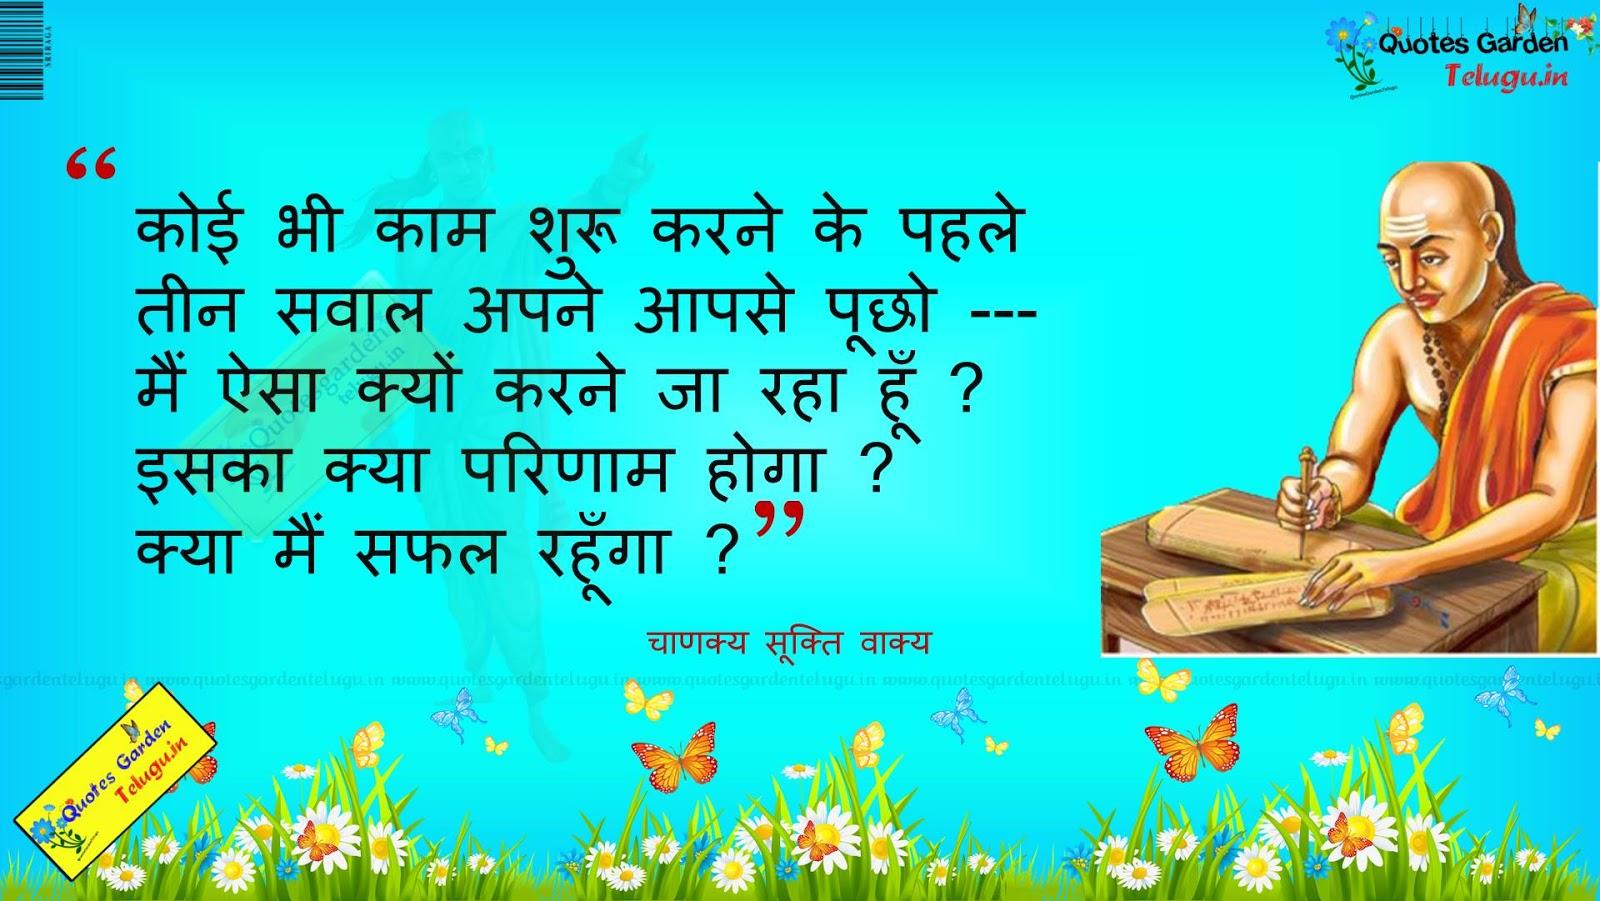 Telugu Love Quotes Hd Wallpapers Chanakya Sukti Vakya Neeti Sutra Suvichar Anmol Vachan In